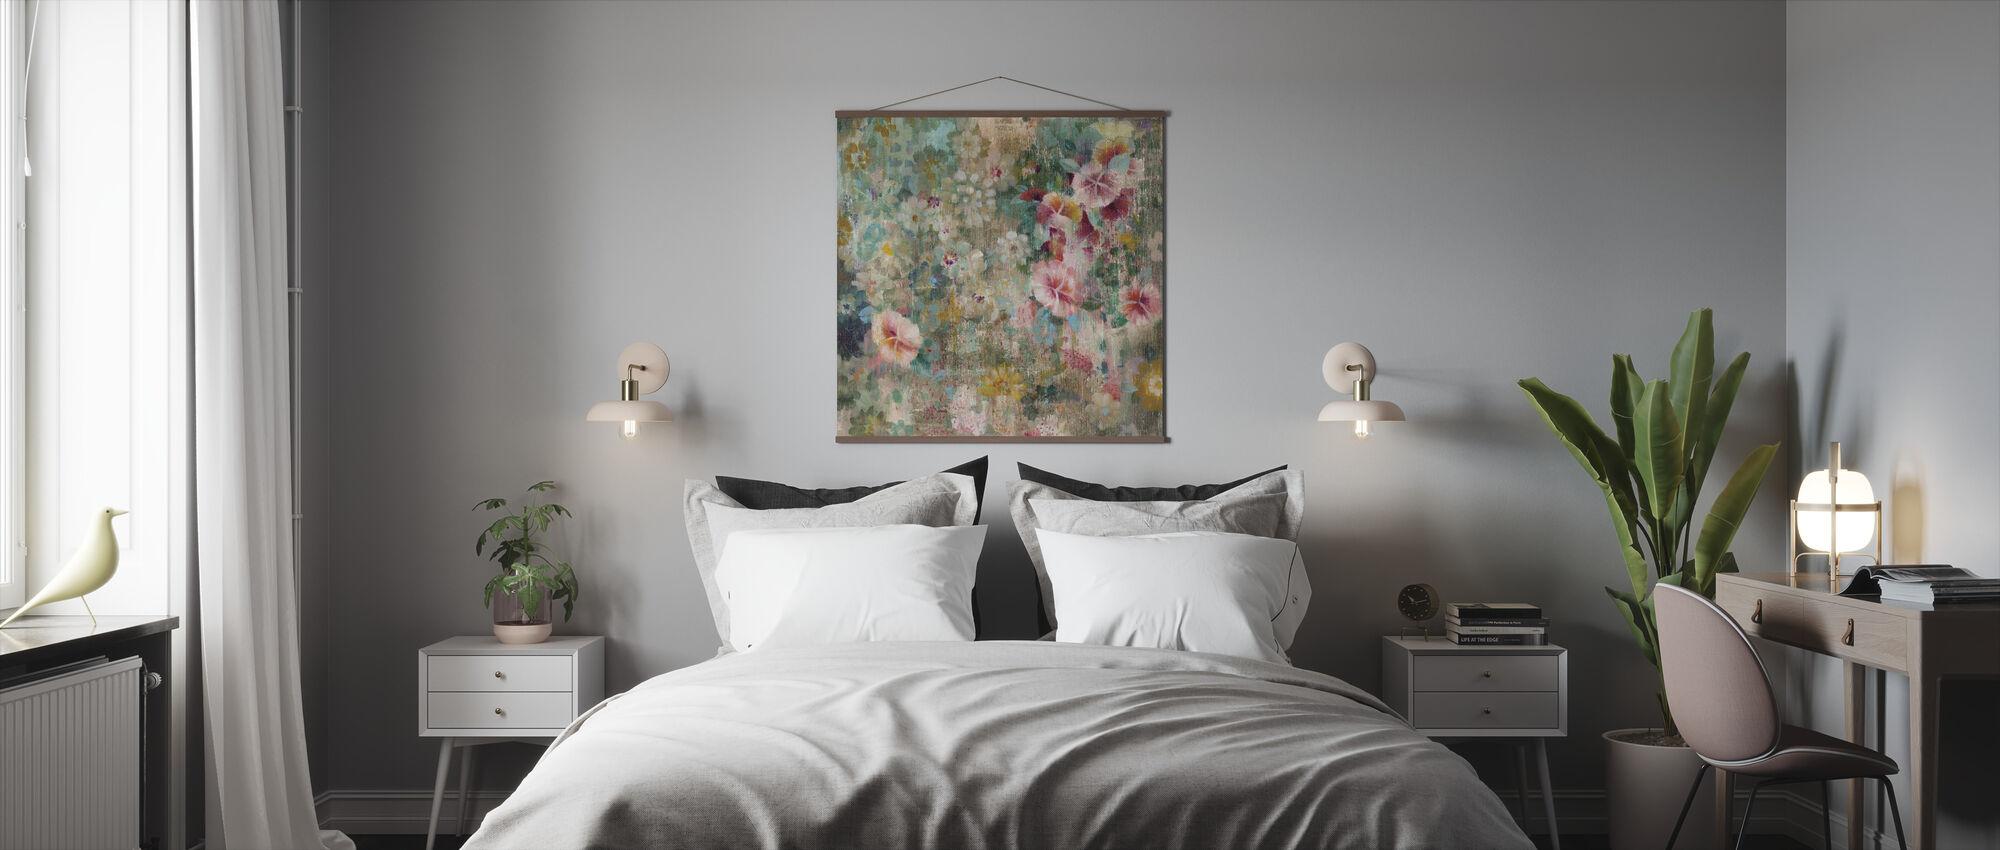 Flower Shower - Poster - Bedroom